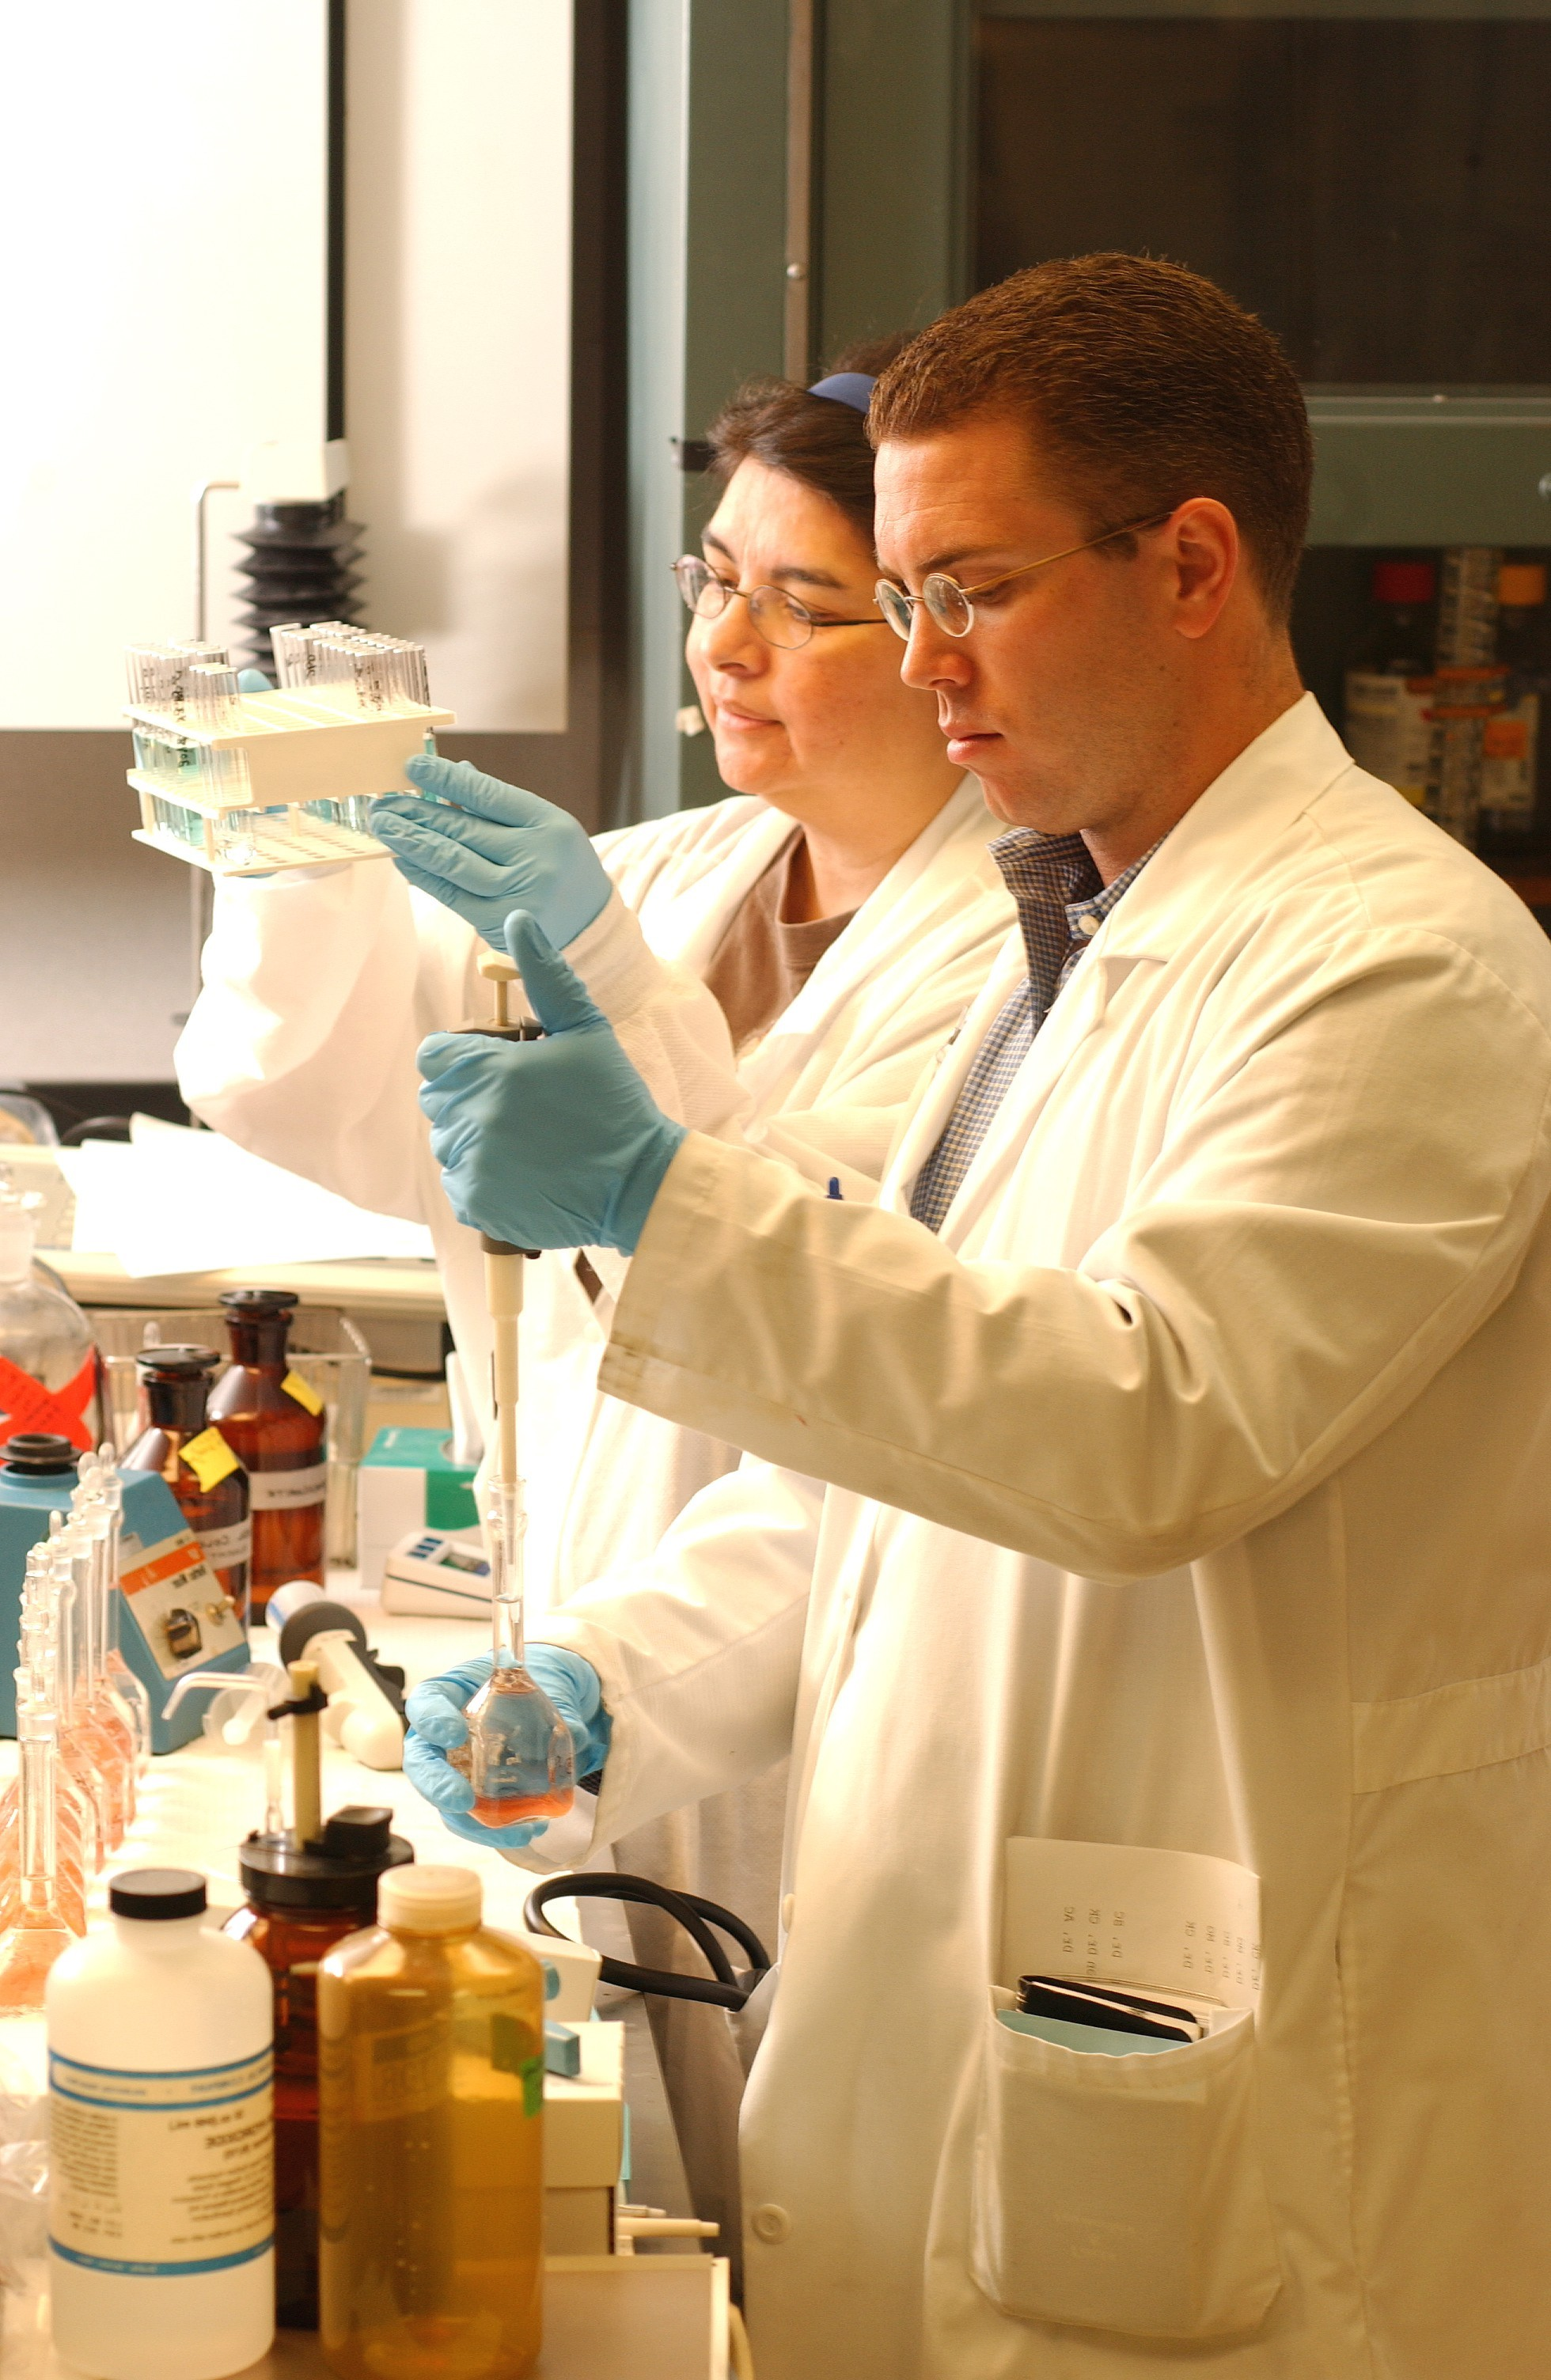 Baylor - Medical Research.JPG